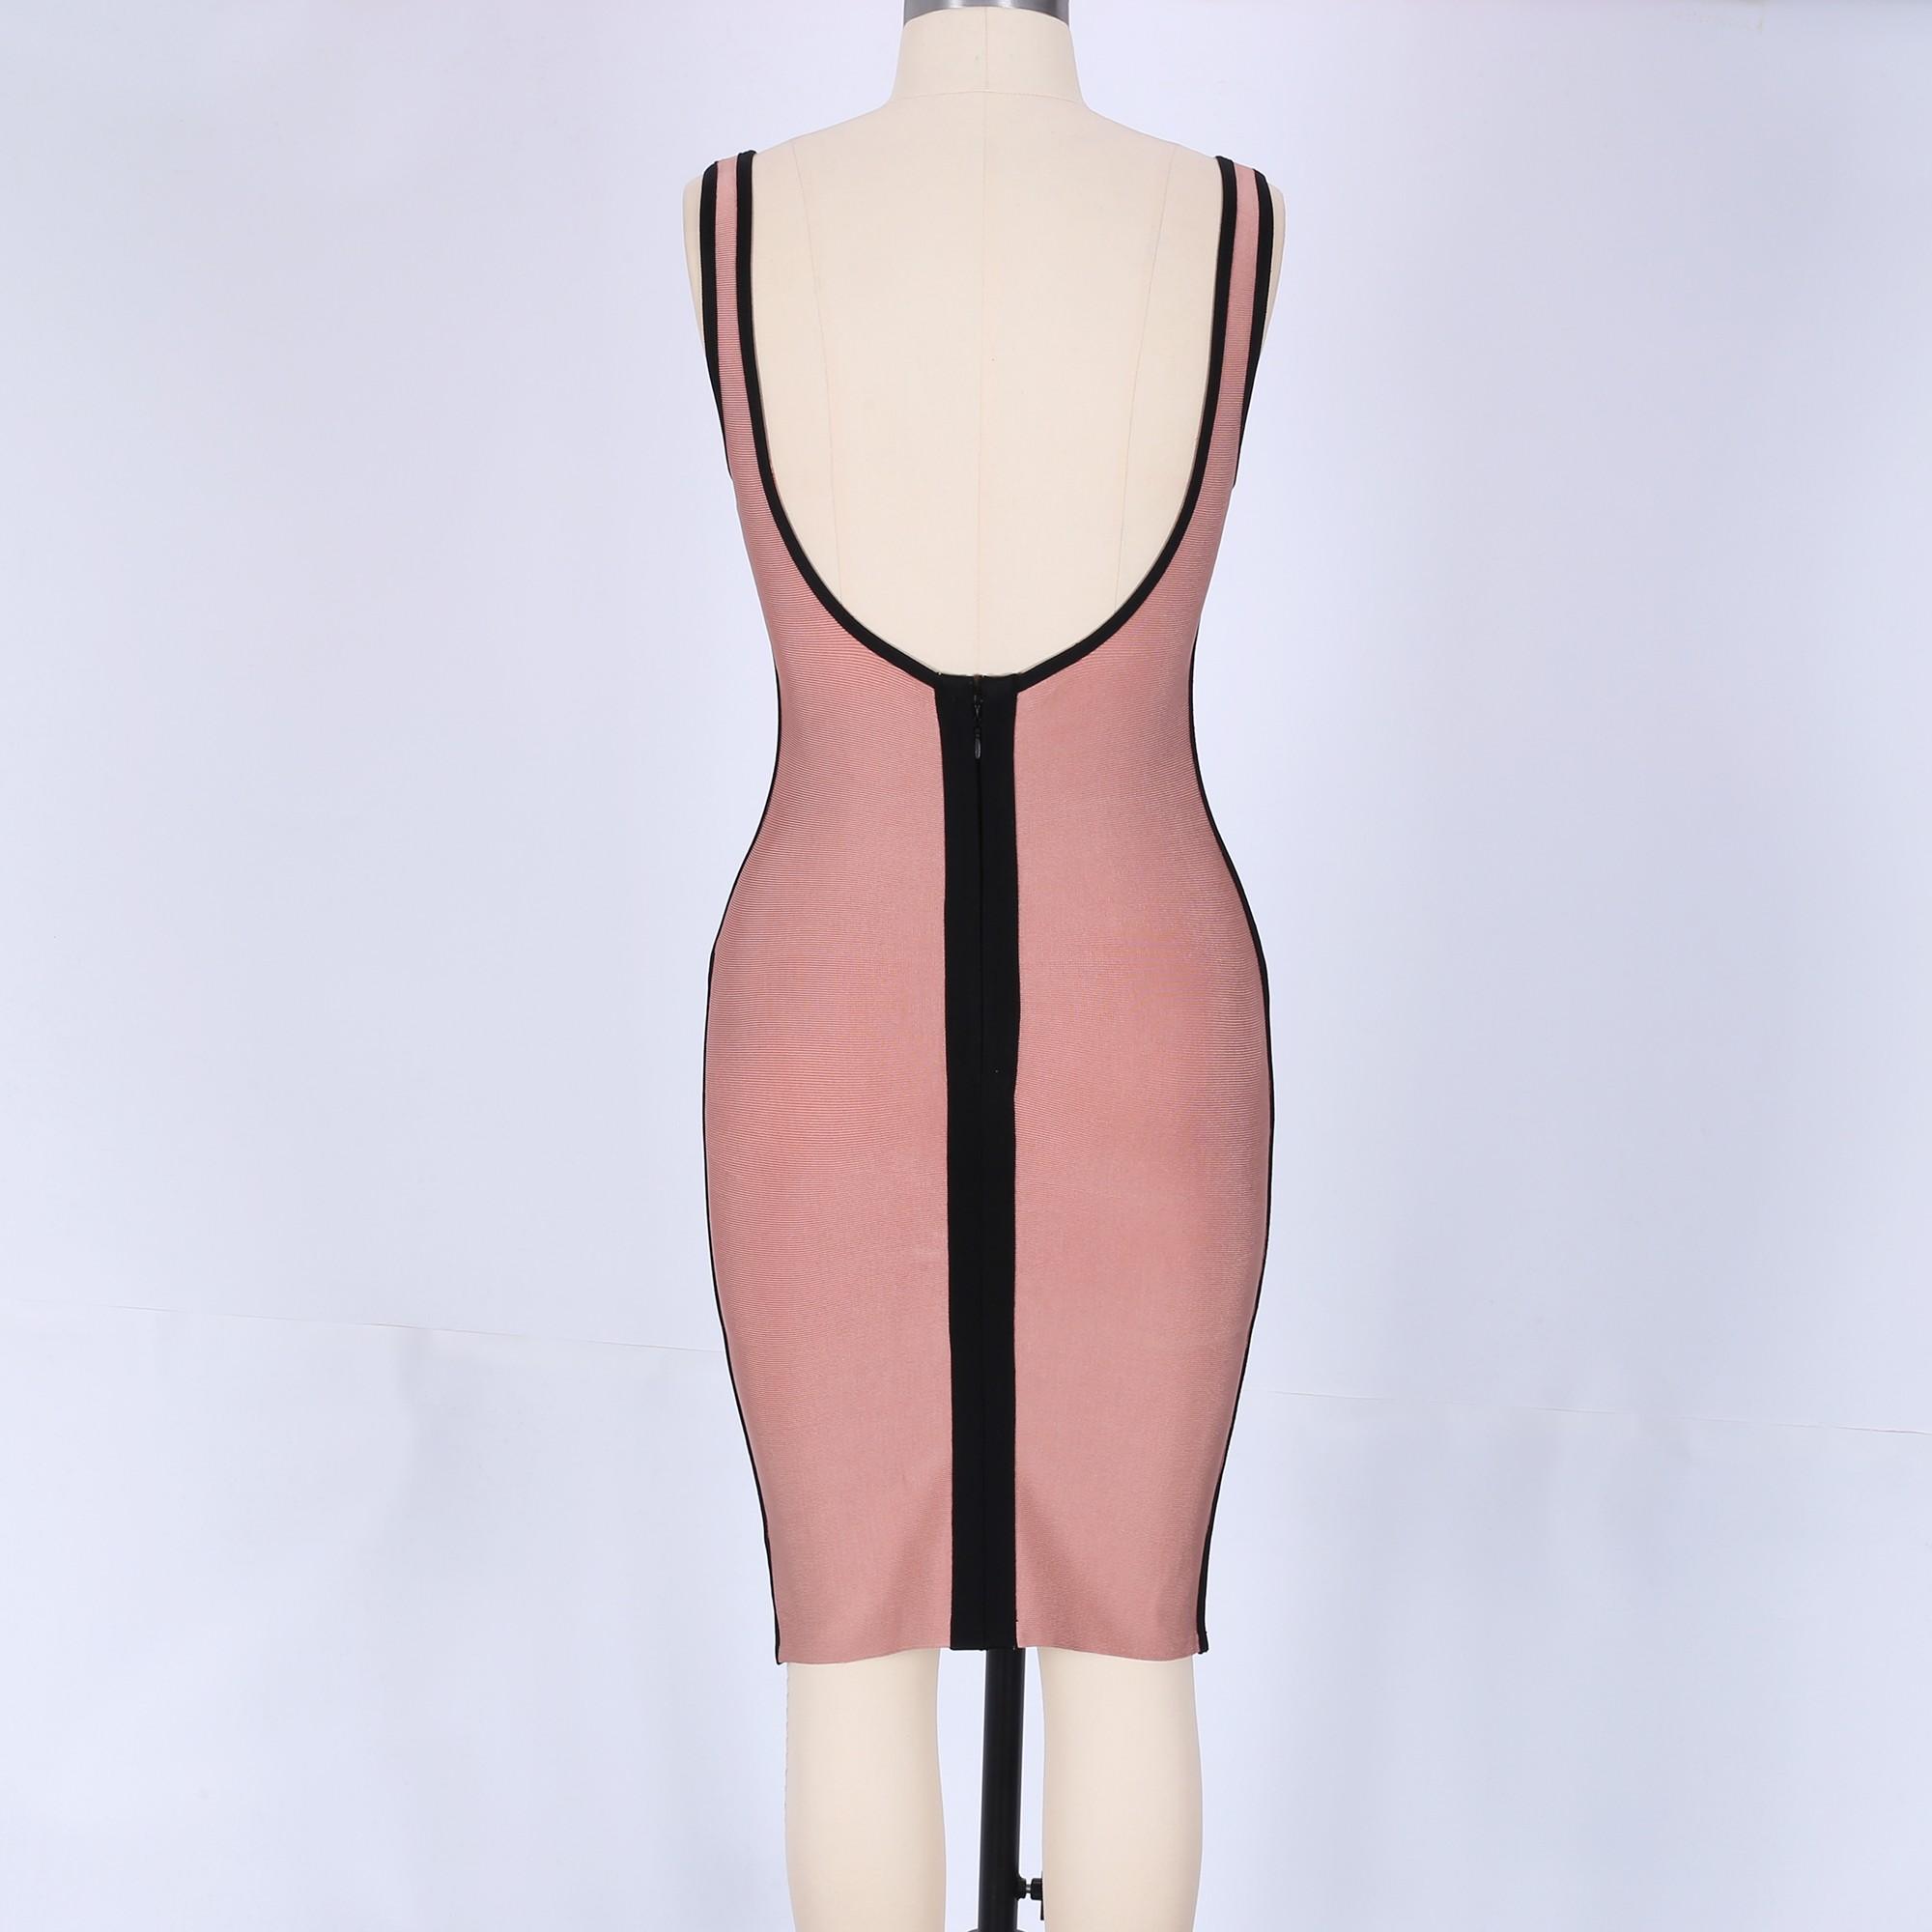 Coffee Strapy Sleeveless Mini Sexy Bandage Dress HK043-Coffee